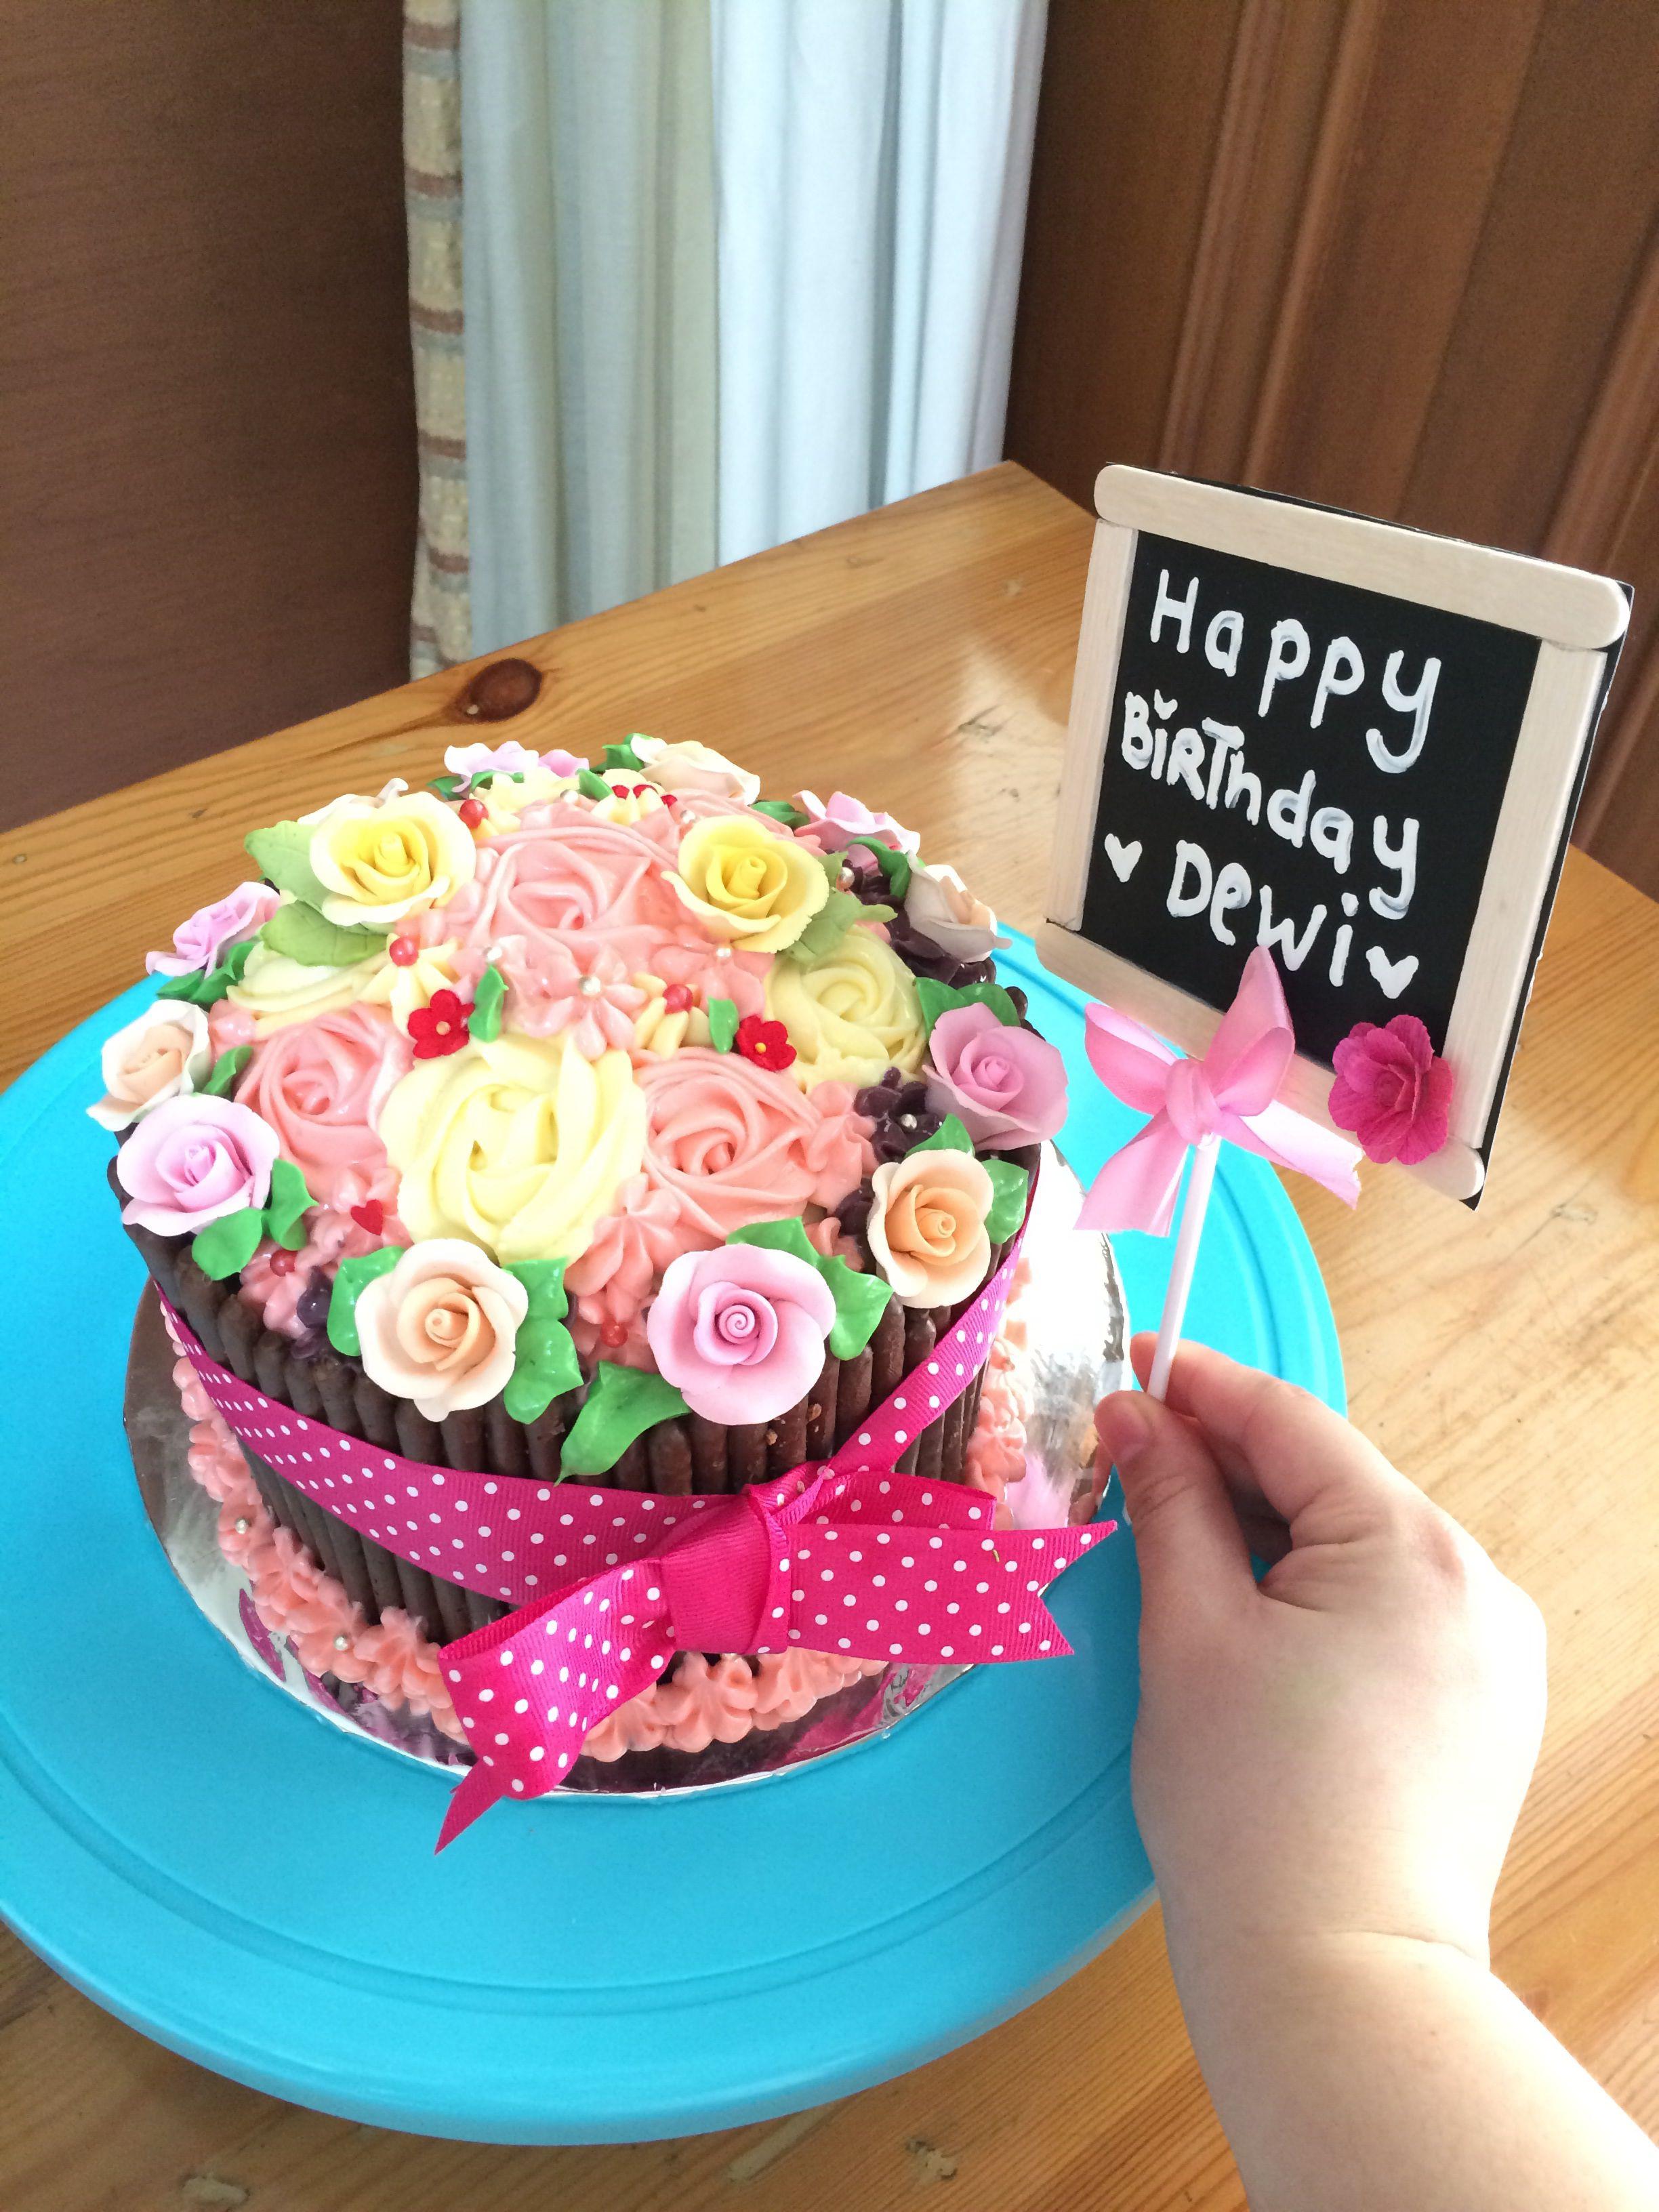 Giant cupcake with rose swirls